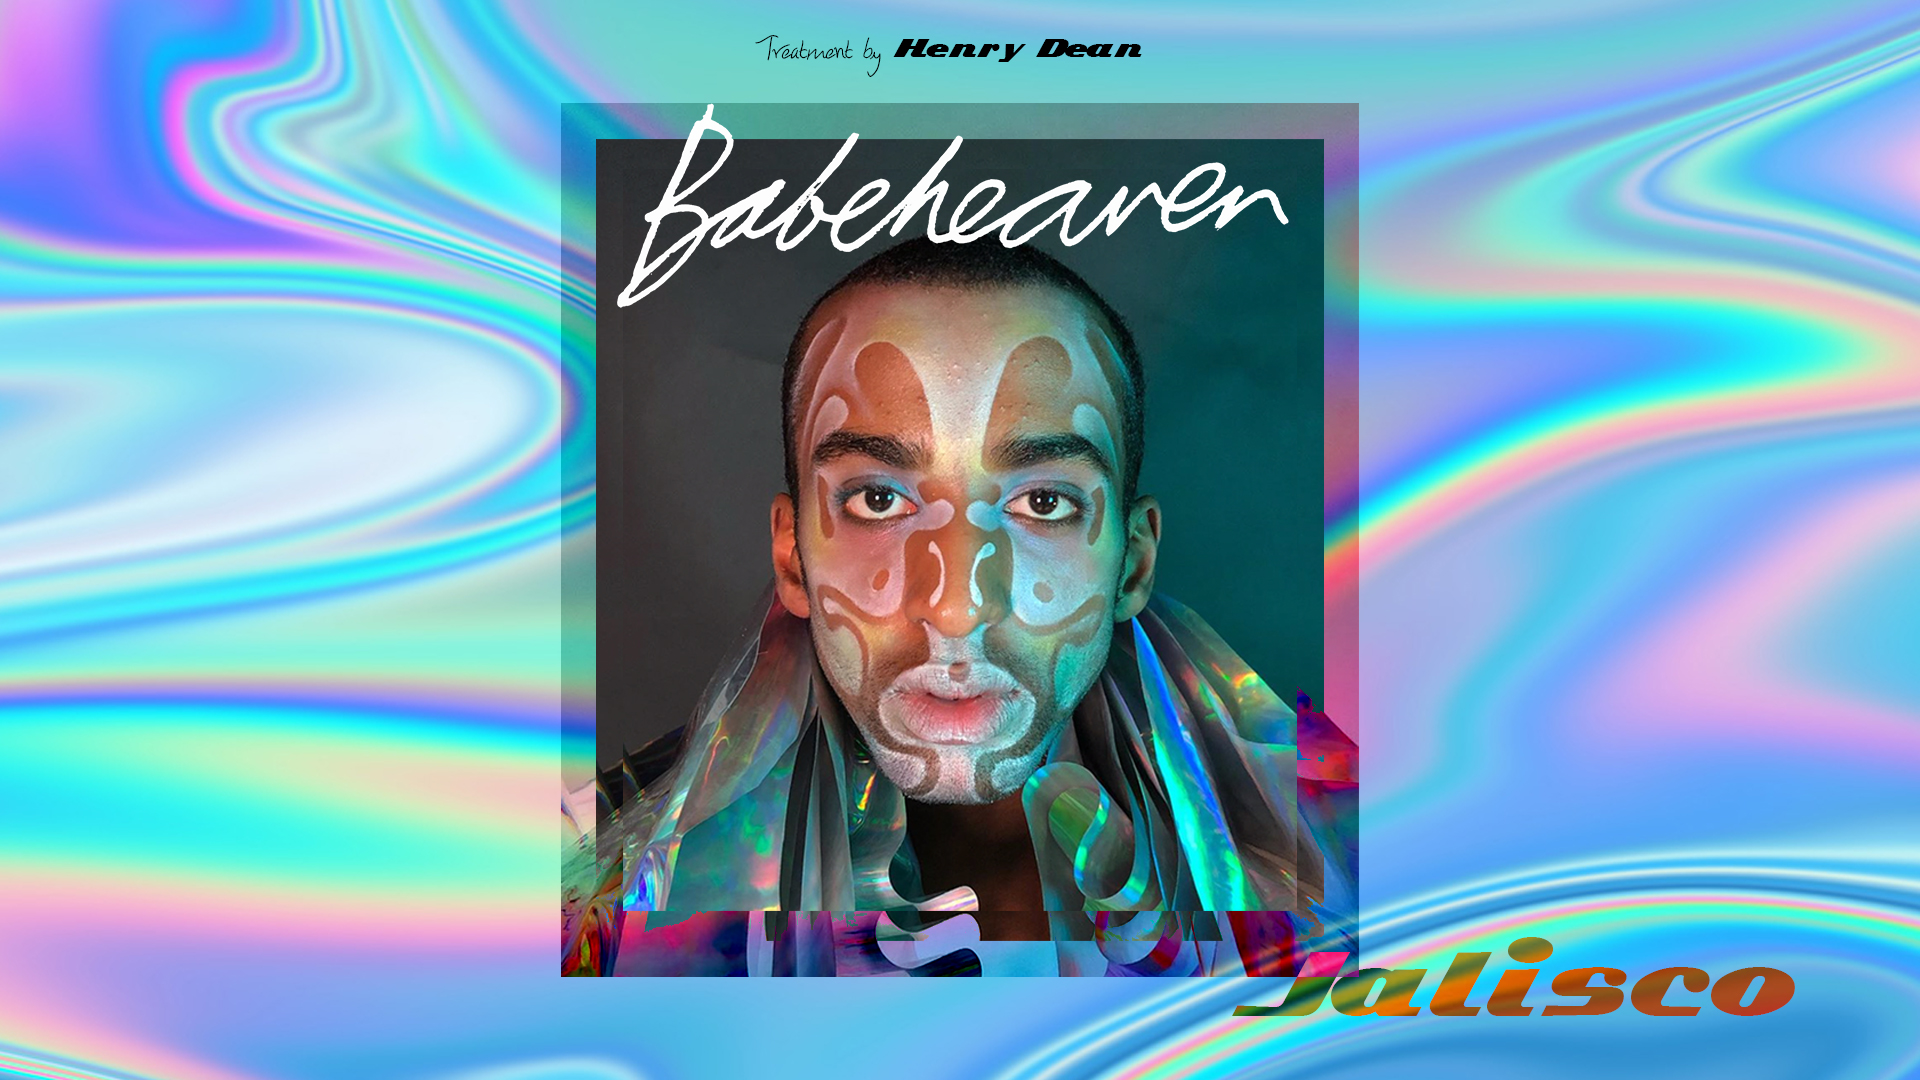 BABEHEAVEN_1.jpg